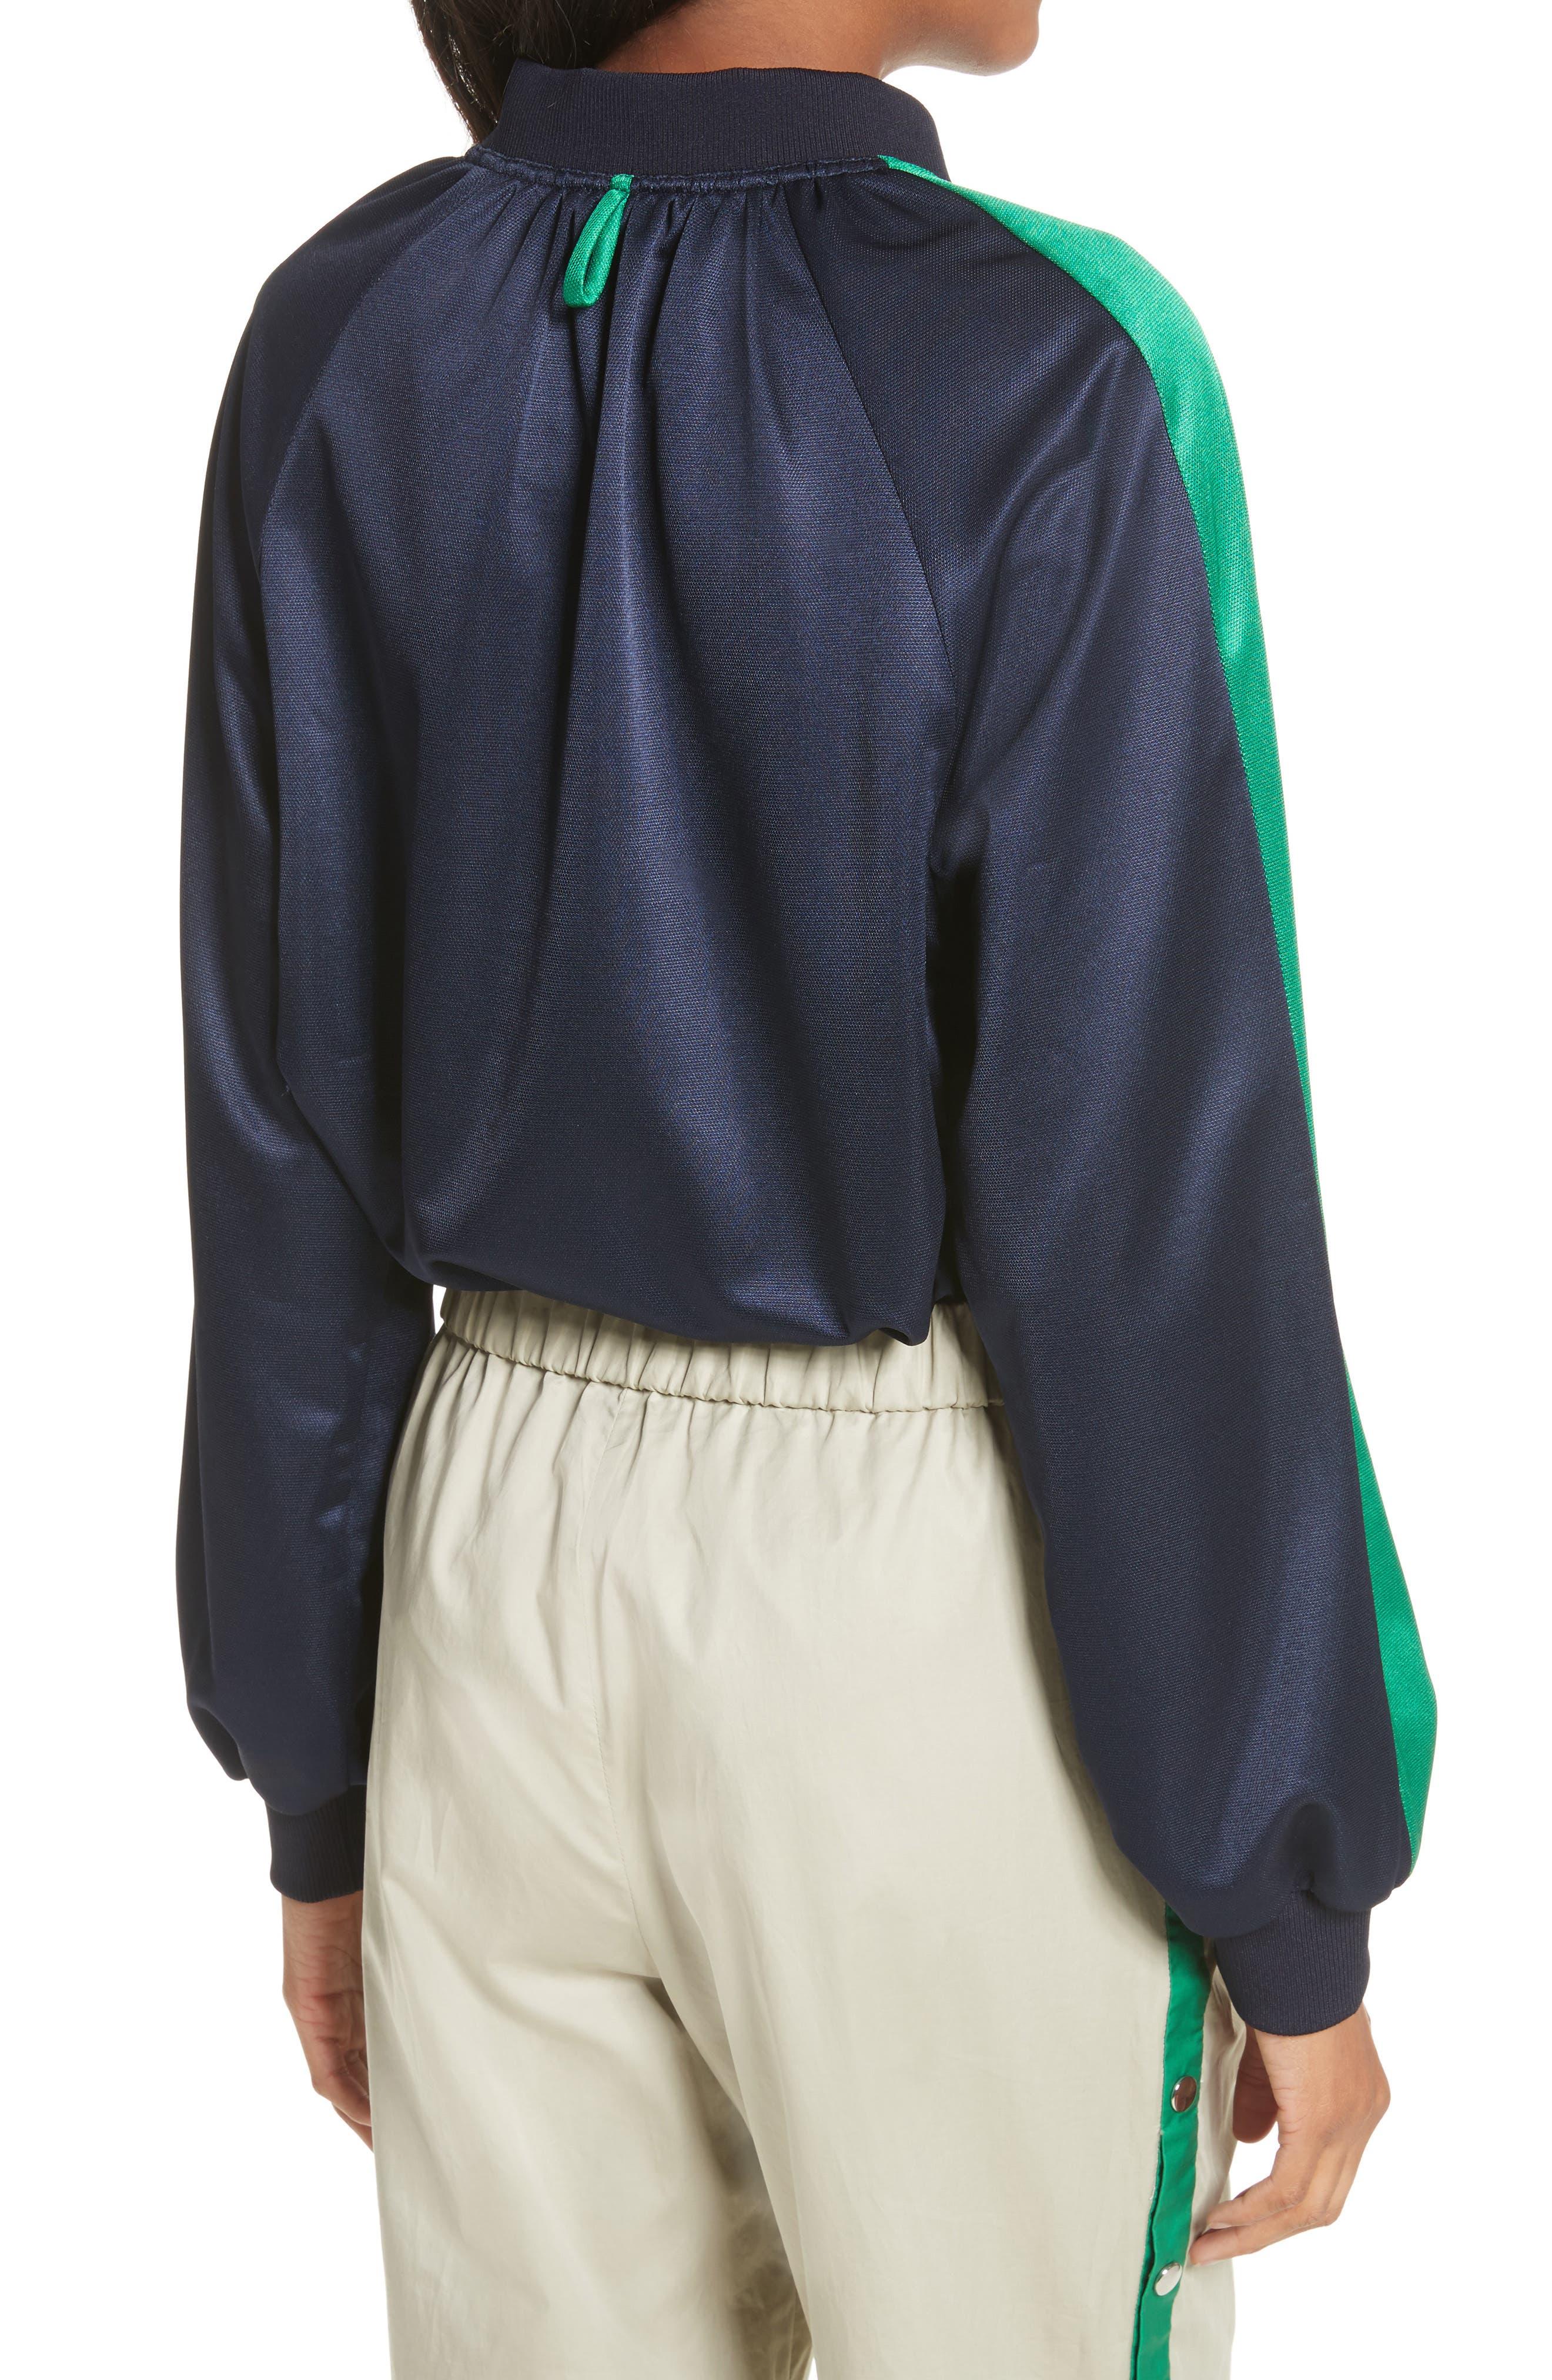 Pullover Track Jacket,                             Alternate thumbnail 2, color,                             Navy/ Green Multi